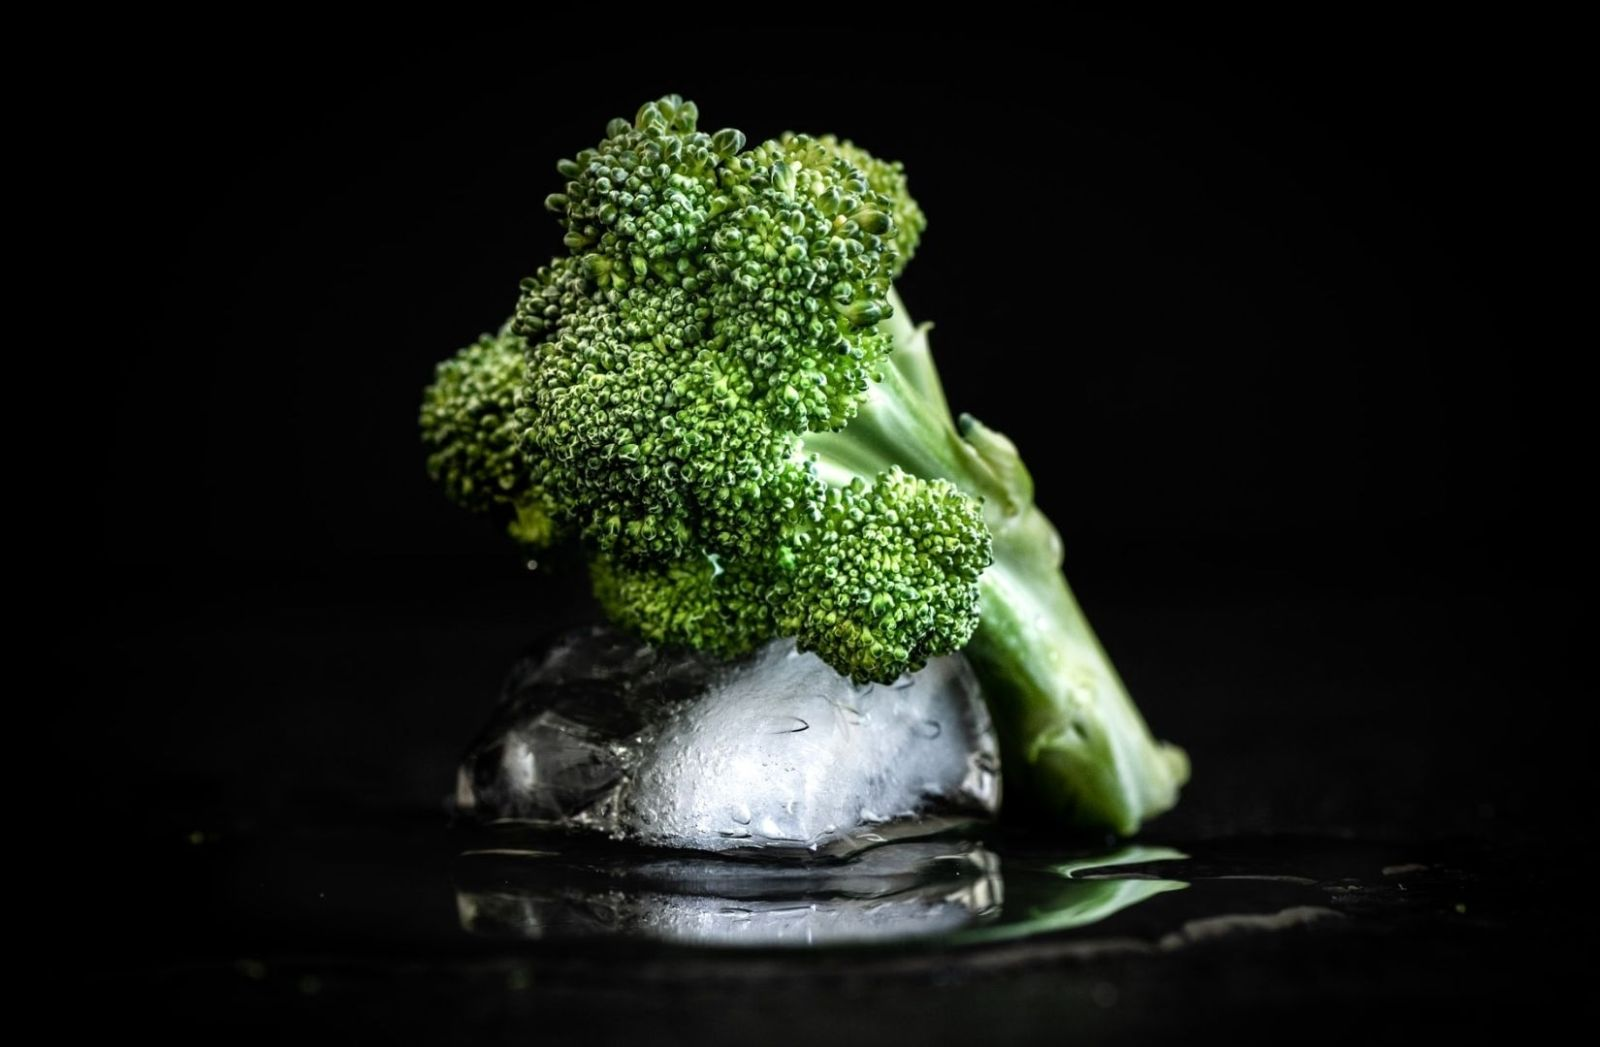 Gemüse auf Eis. (Foto; blackishoot, Unsplash.com)